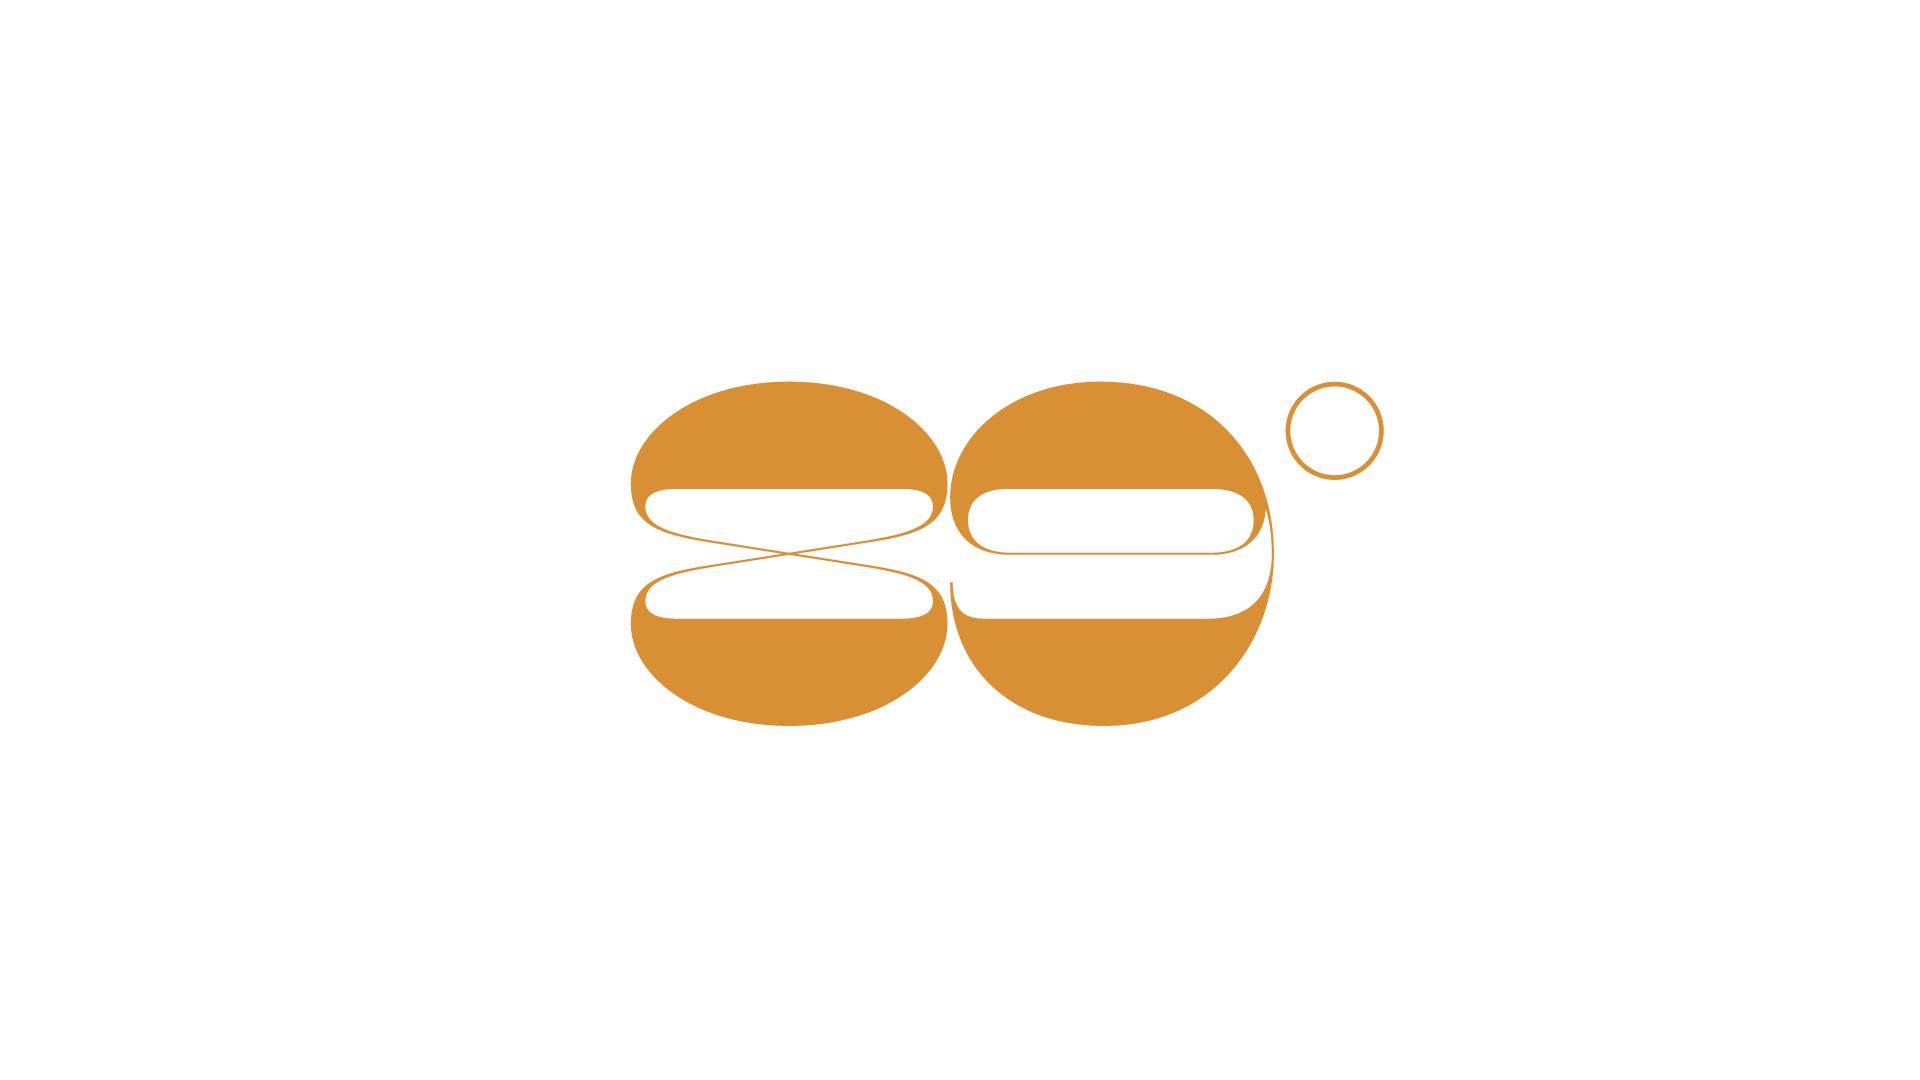 Logo de 89 grados